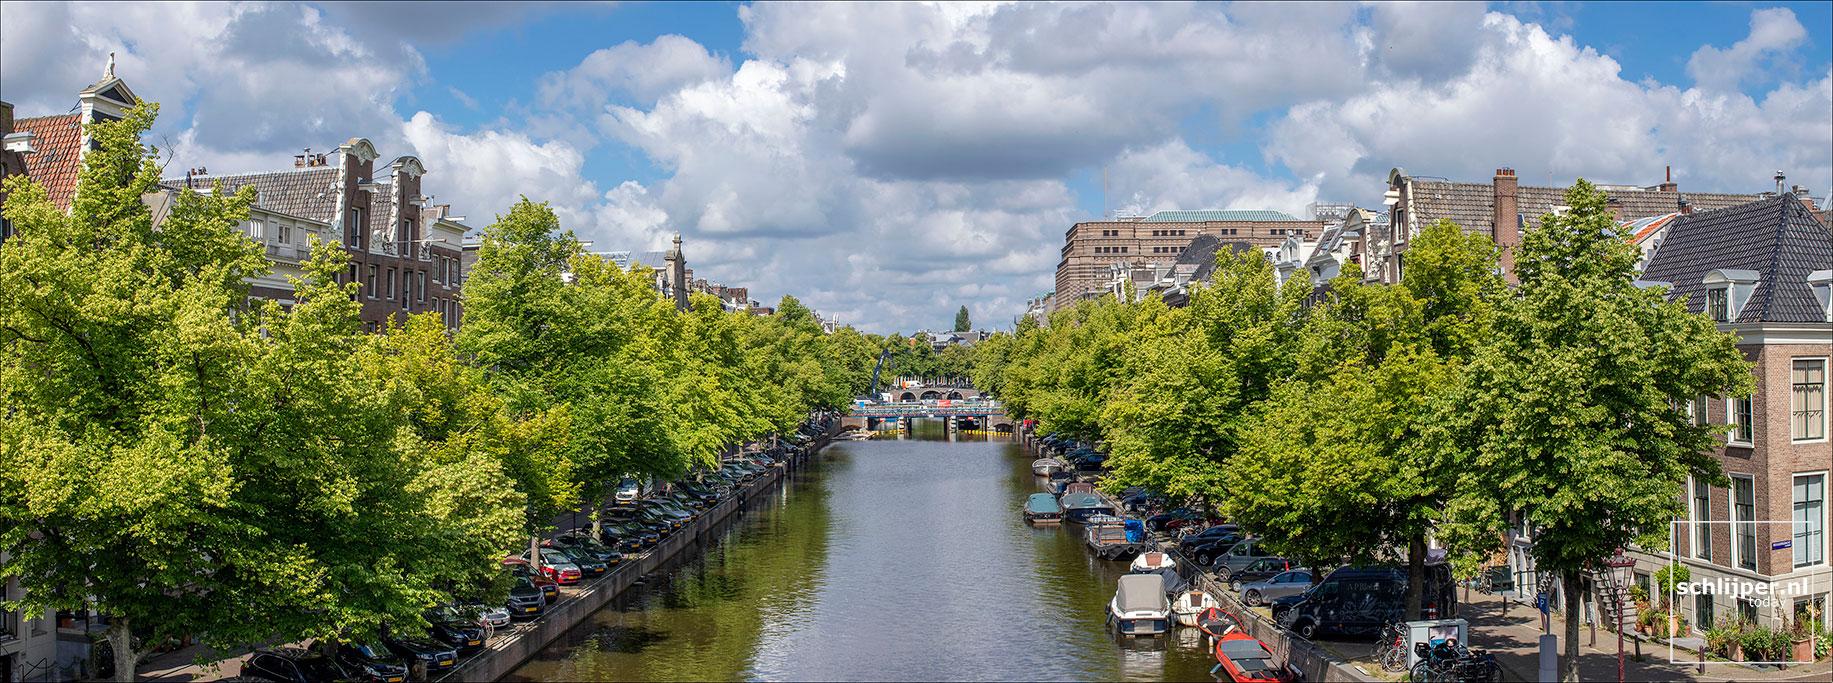 Nederland, Amsterdam, 20 juni 2020